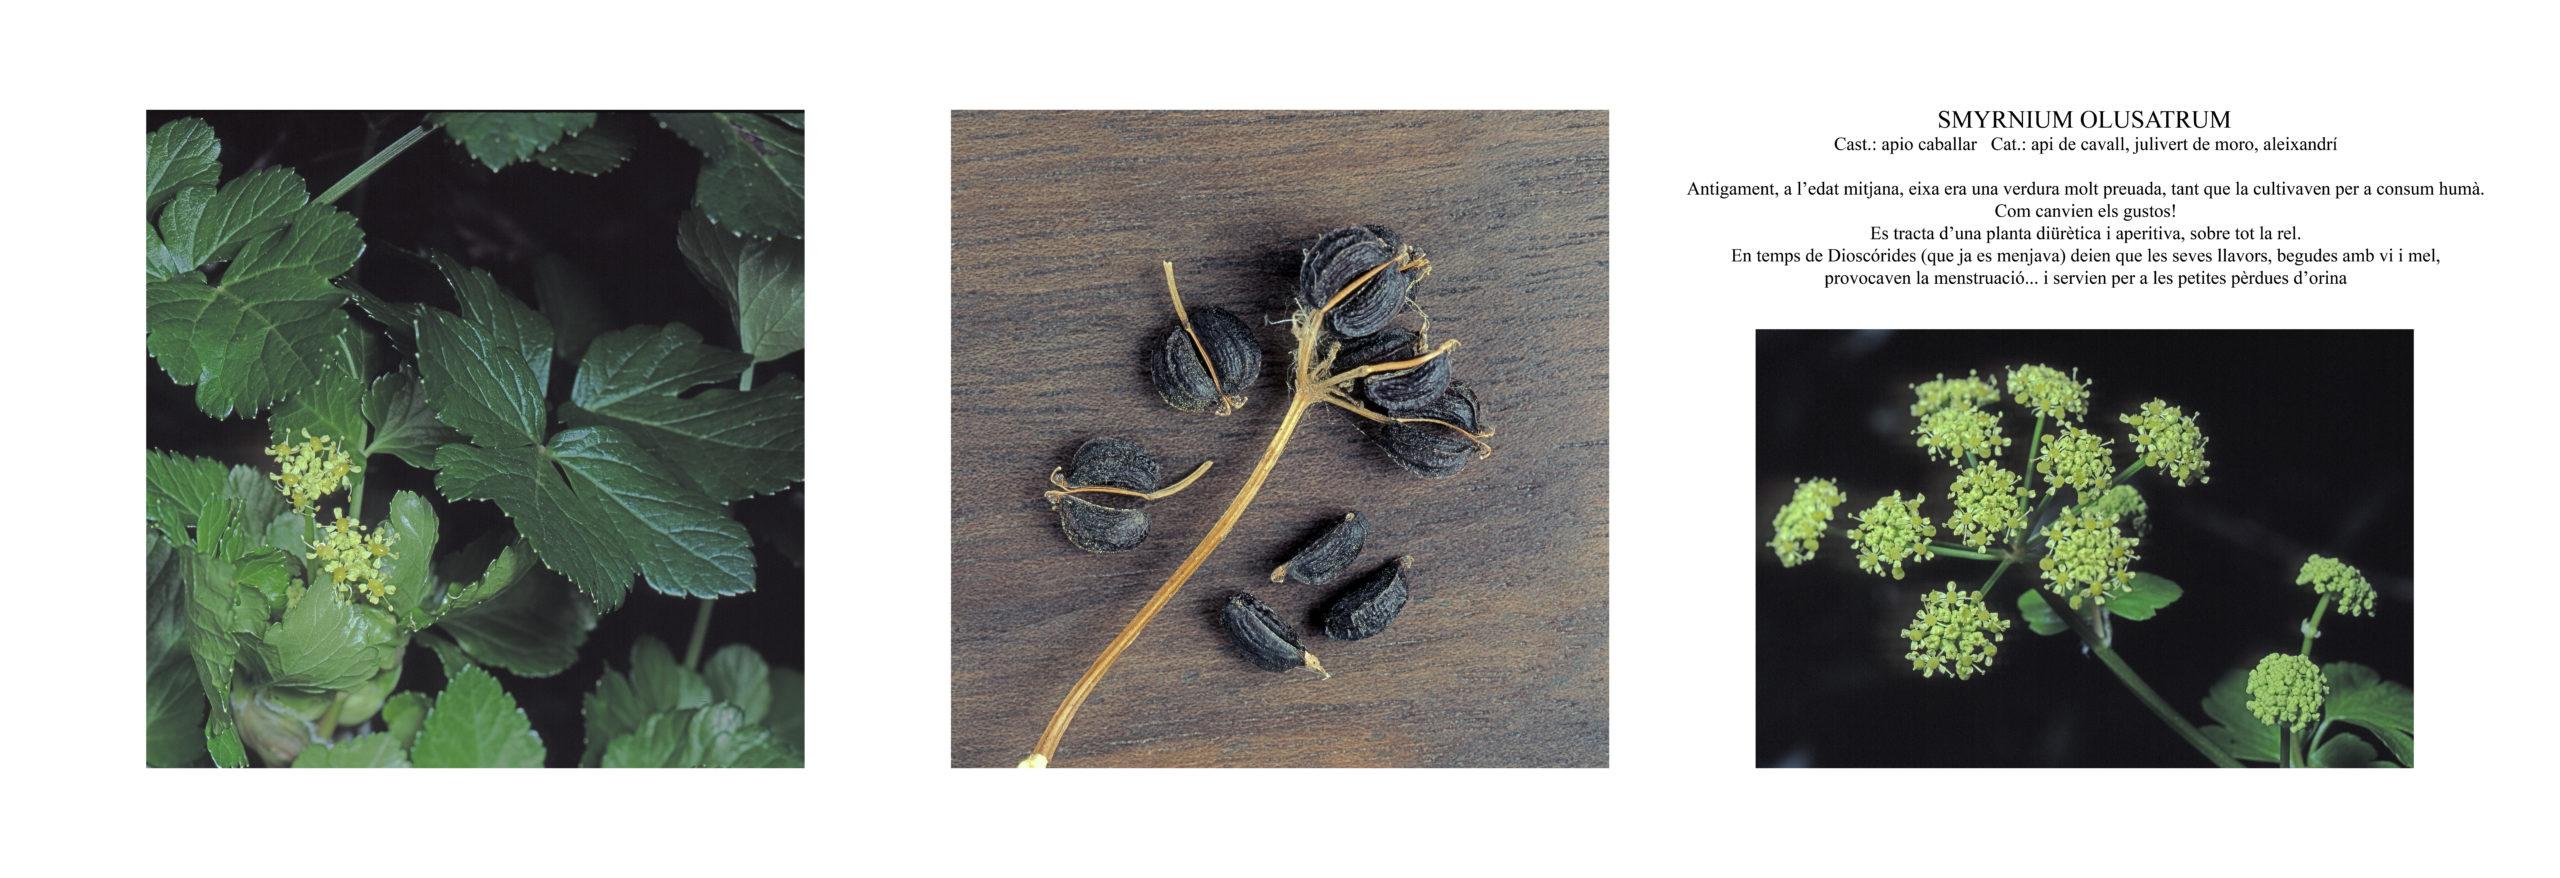 Pep Bonet Capellá-Botánica-Semillas-Macro fotografía (9)